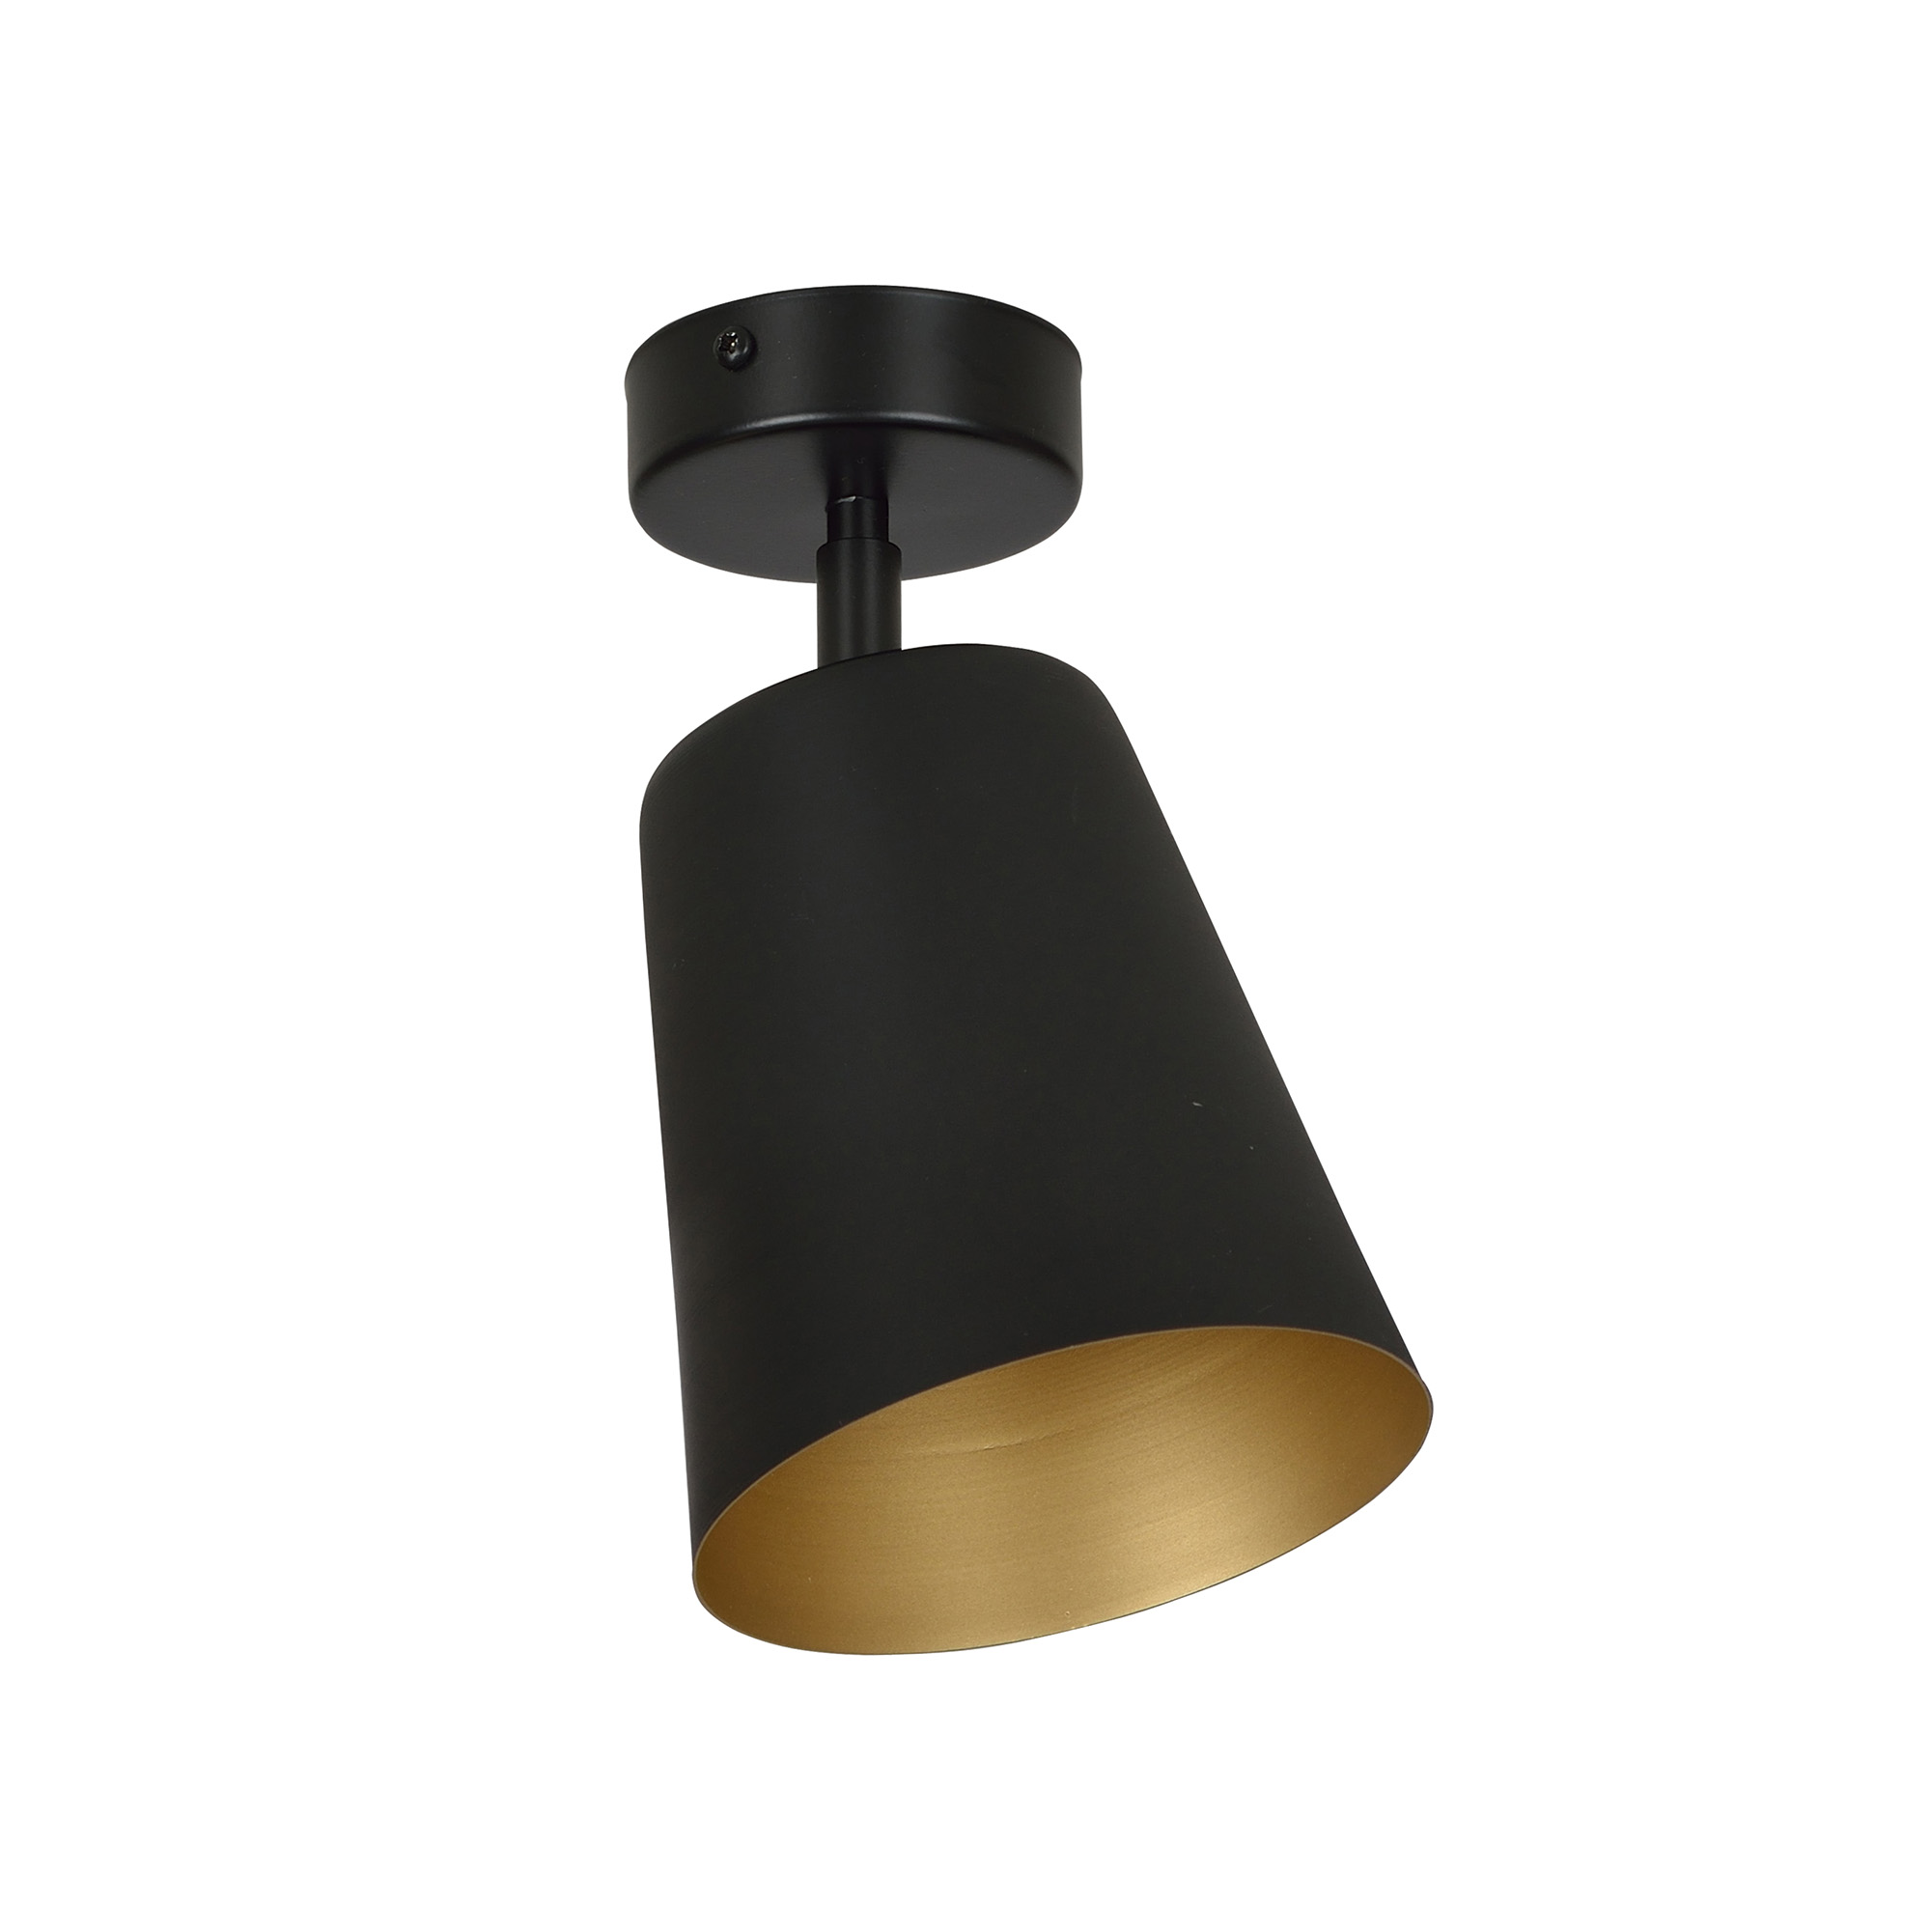 Deckenstrahler Schwarz Gold Retro flexibel E27